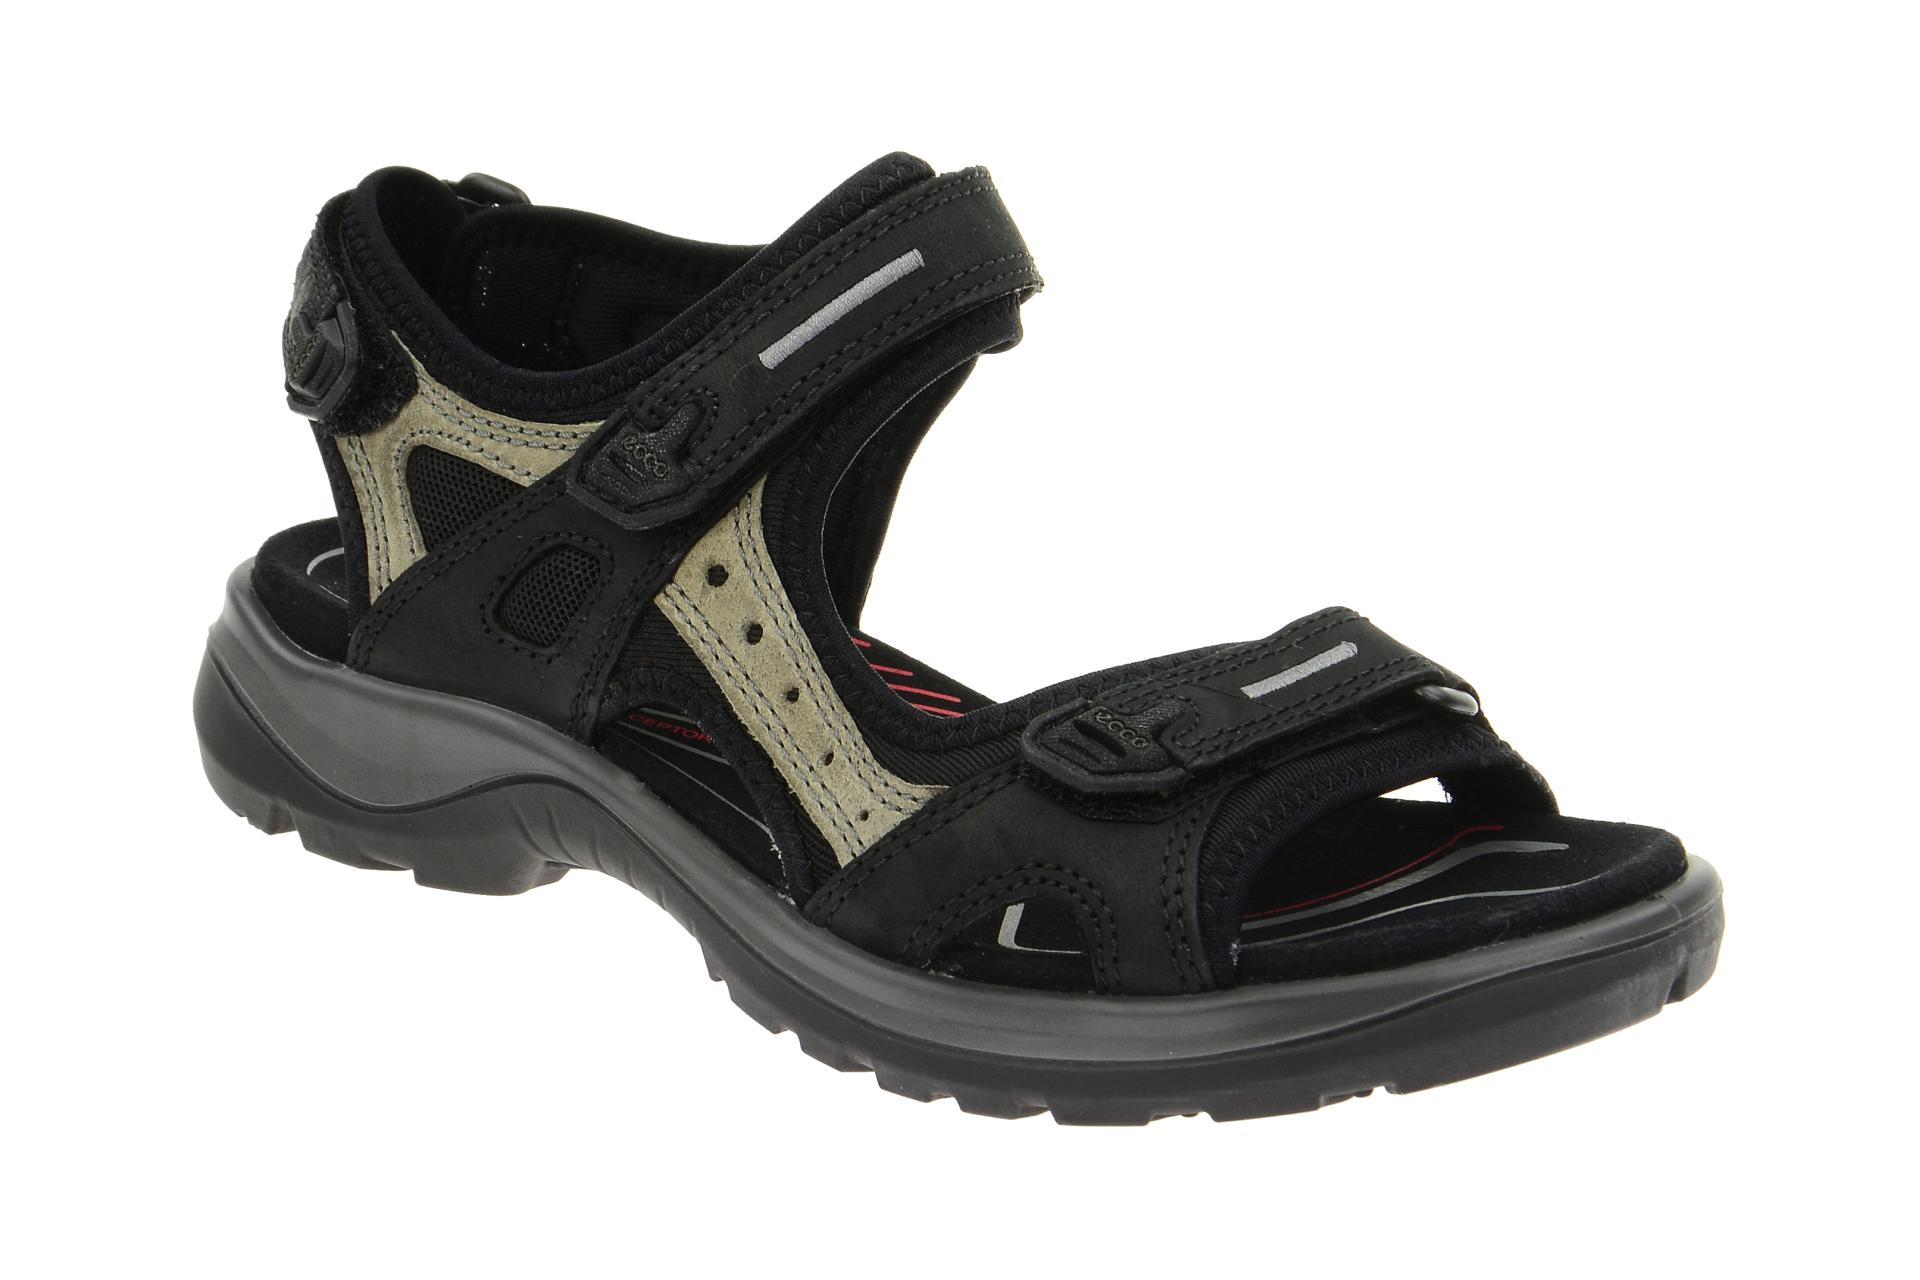 ecco trekking sandaletten offroad schwarz grau damen. Black Bedroom Furniture Sets. Home Design Ideas